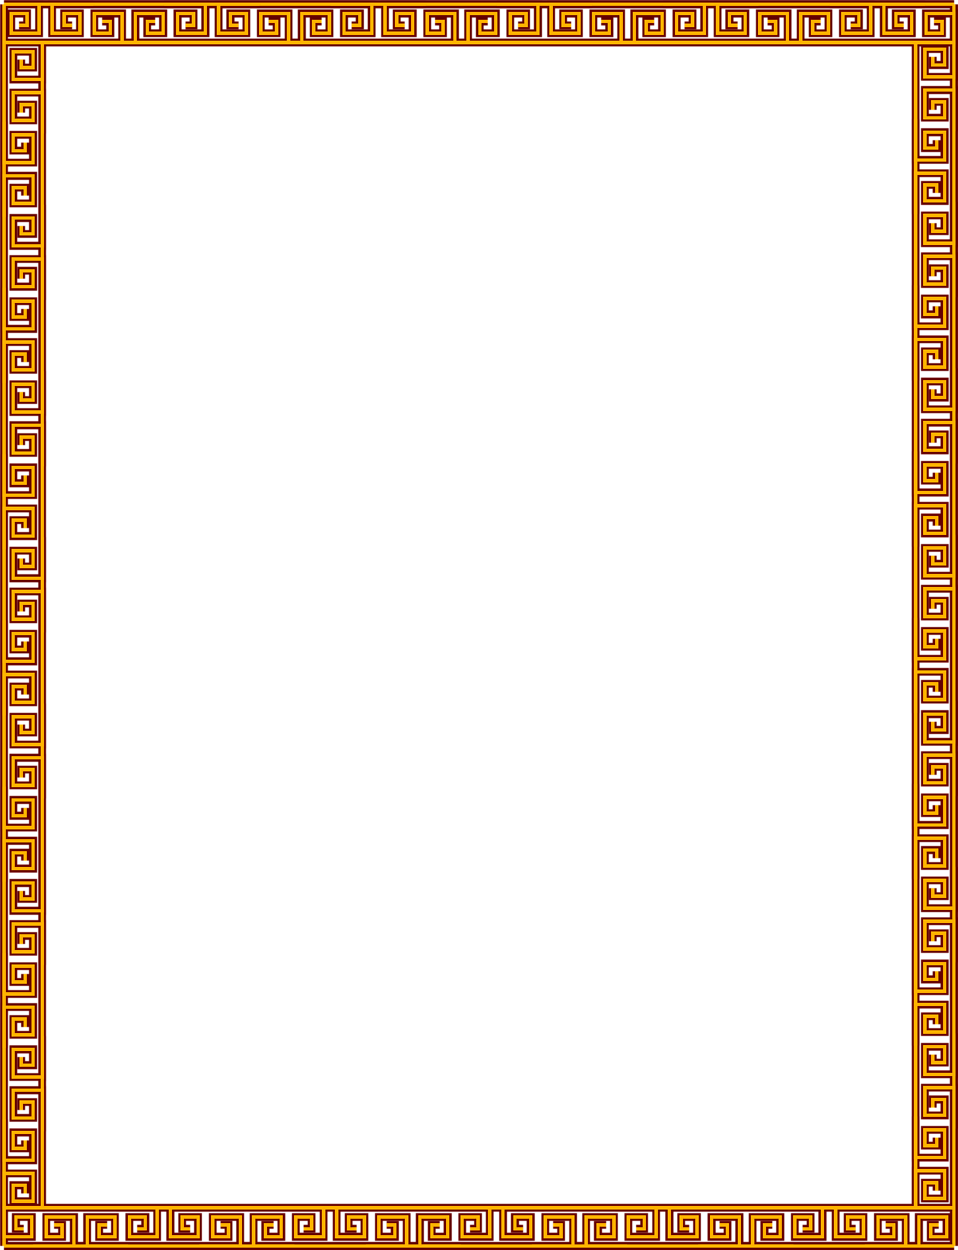 Border | Free Stock Photo | Illustration of a blank ornate frame ...